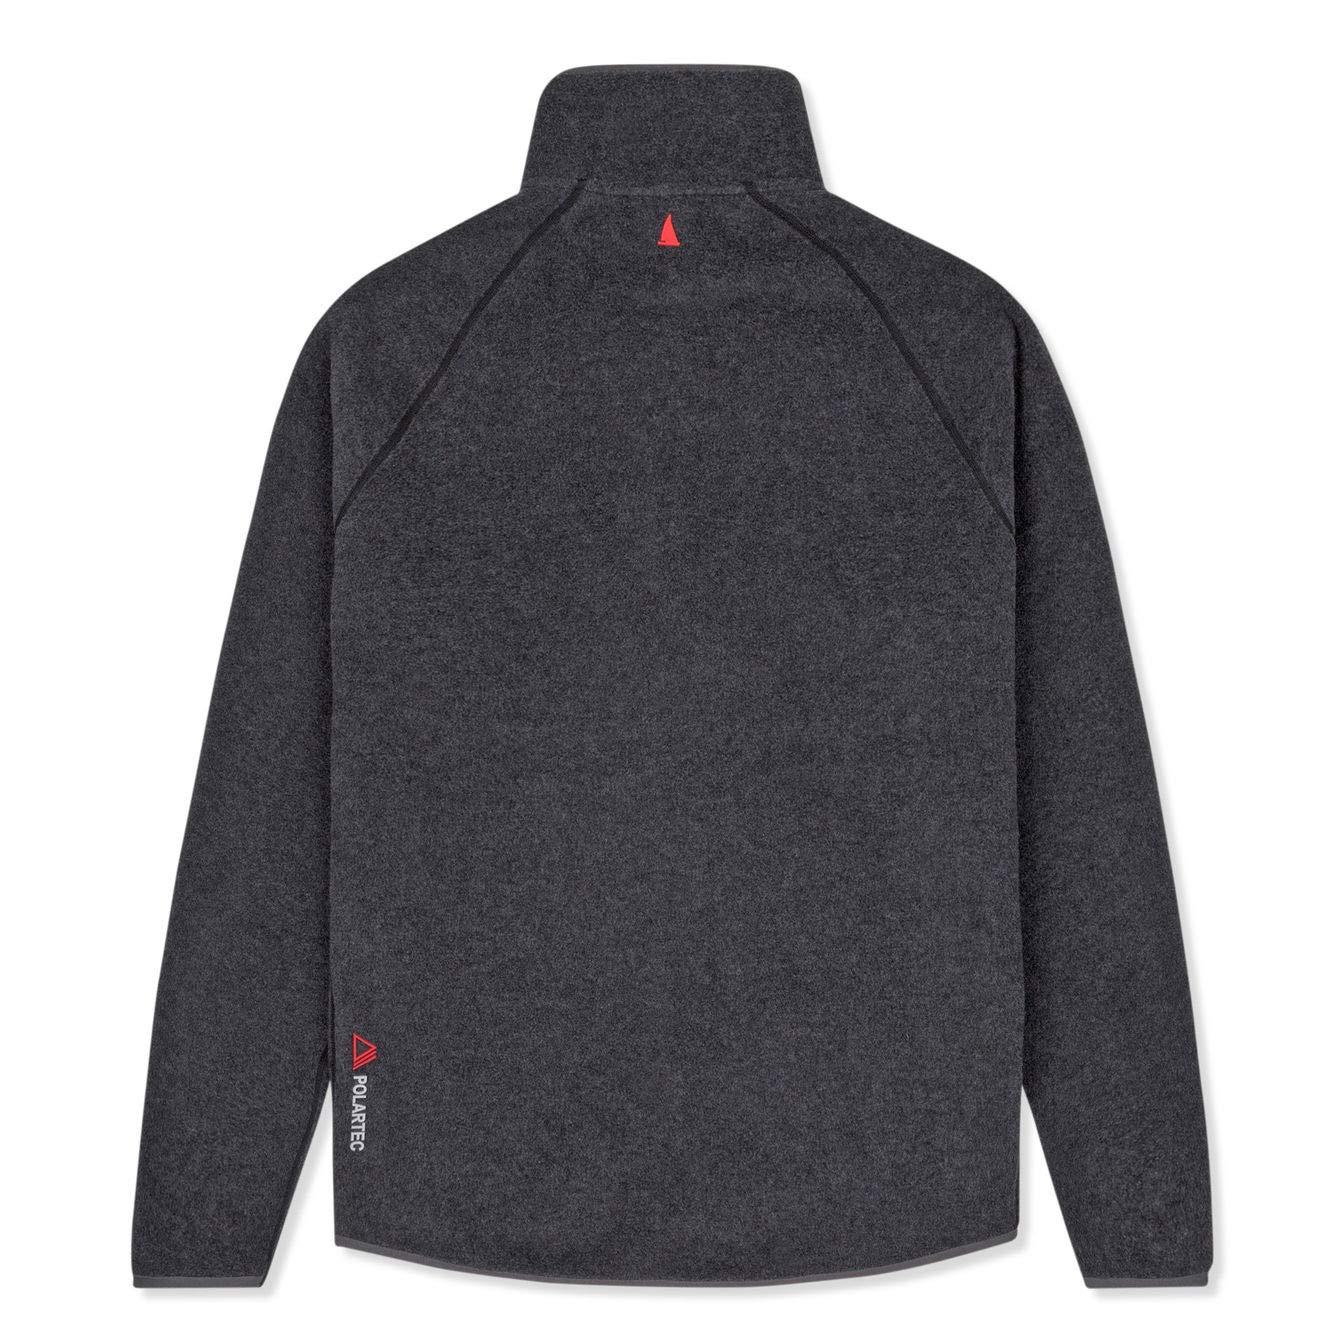 Musto Mens Essential Polartec Warm Fleece Coat Jacket Charcoal Two hand pockets